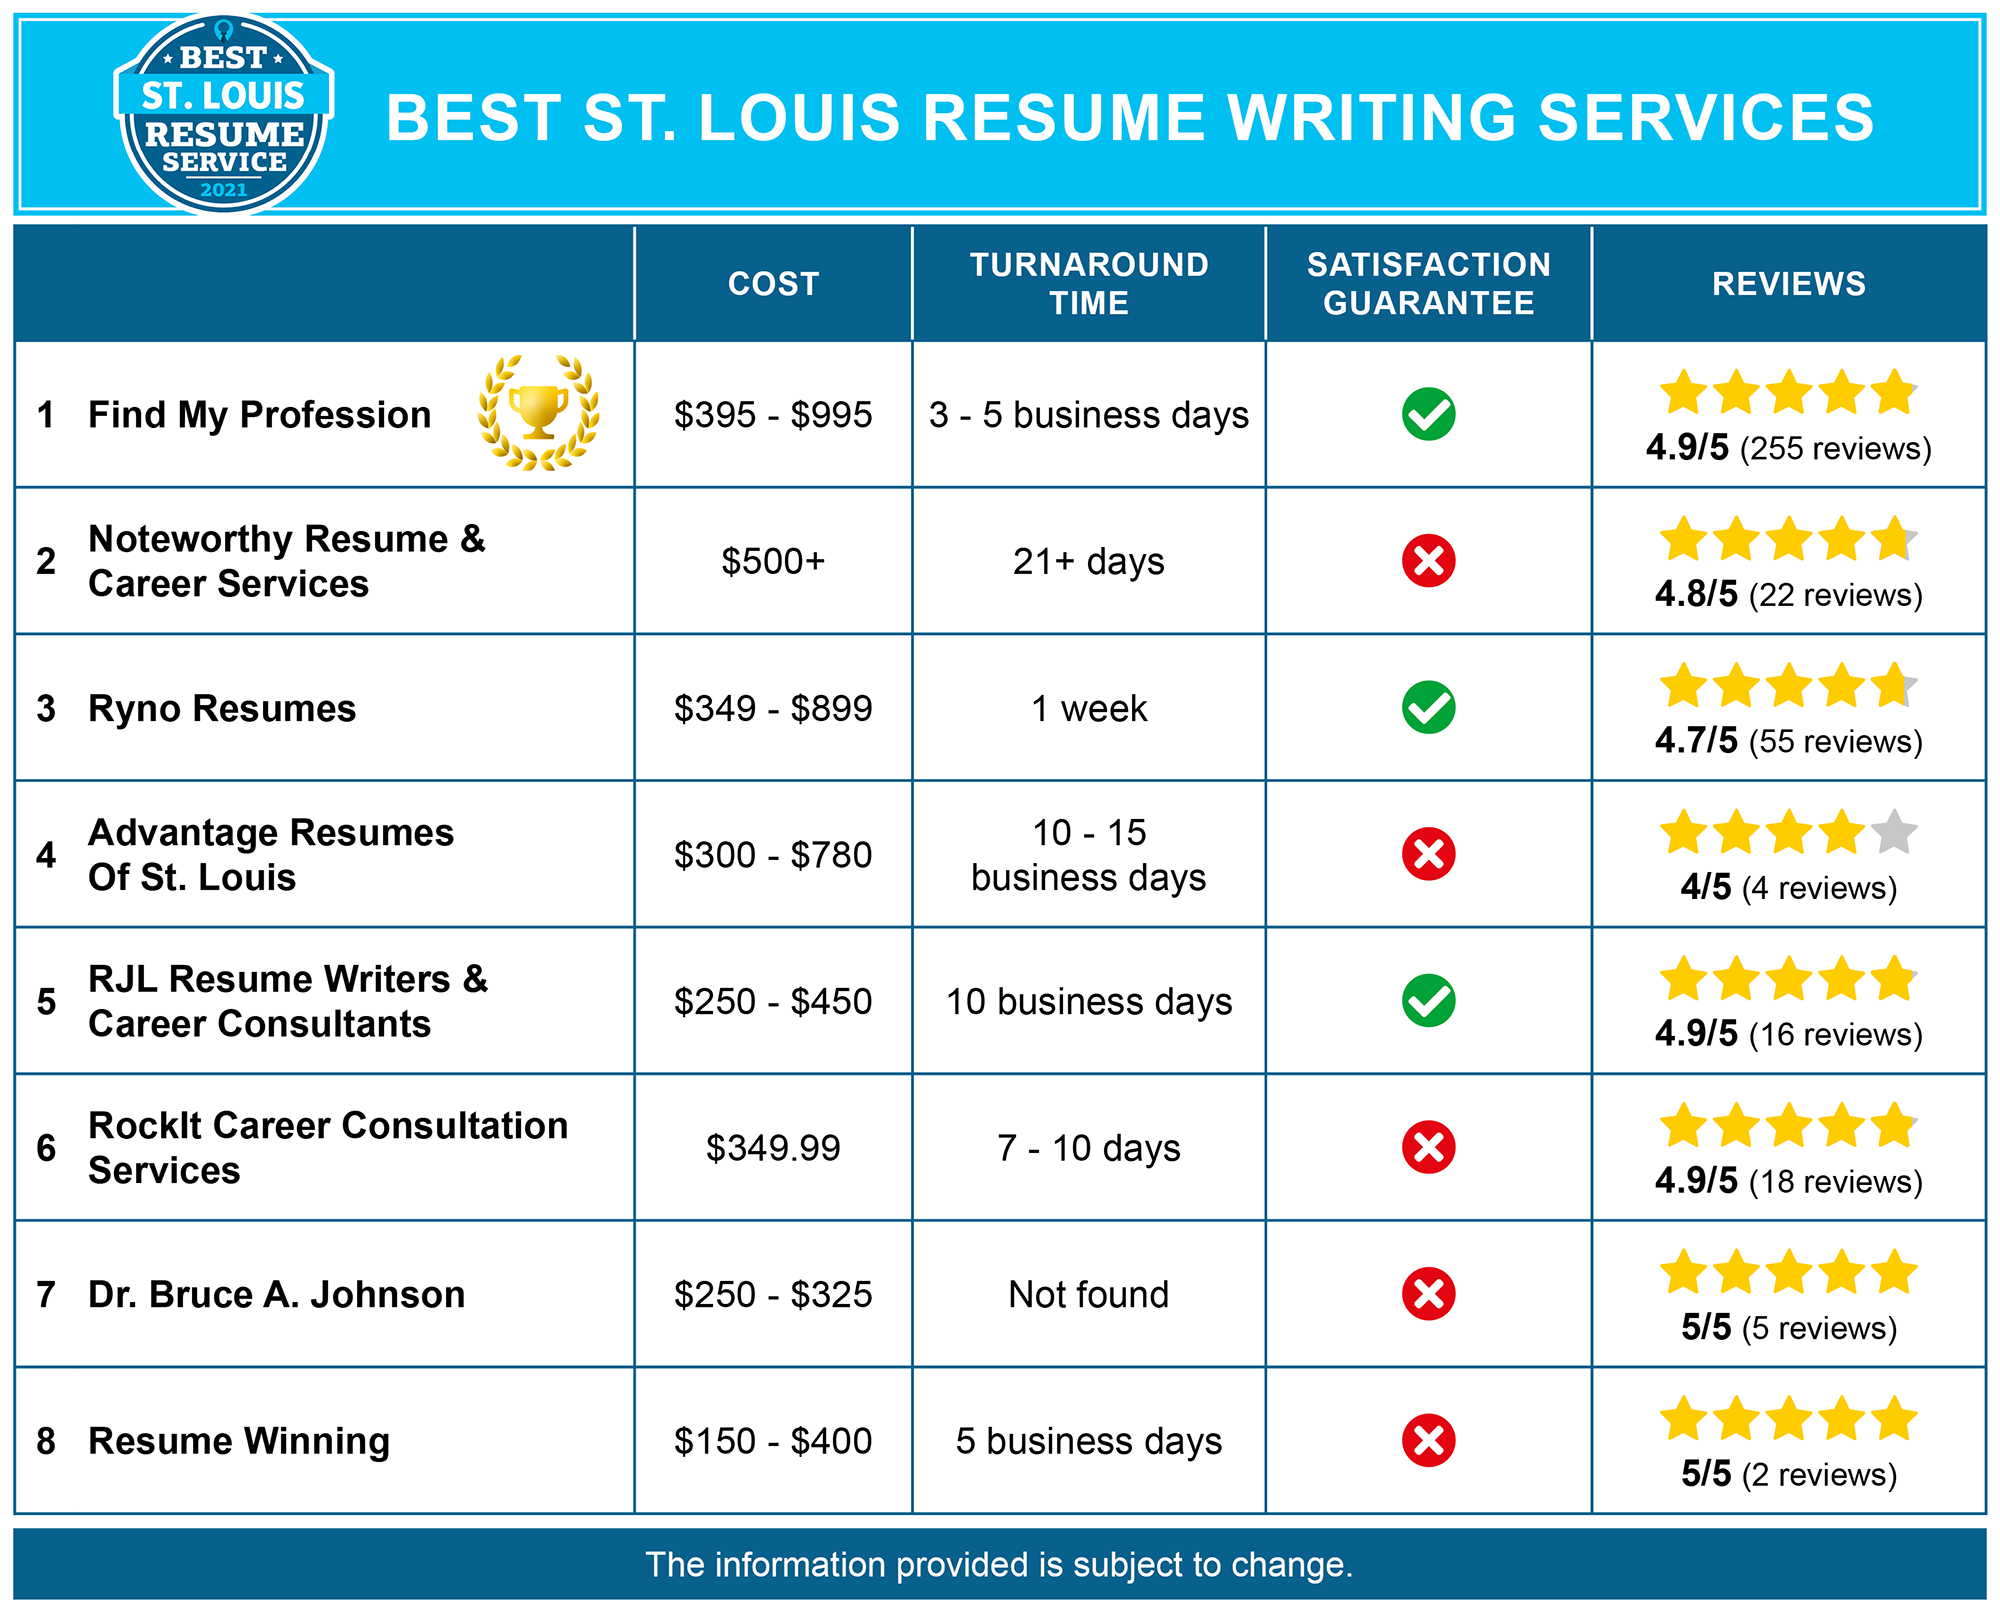 Best St. Louis Resume Services